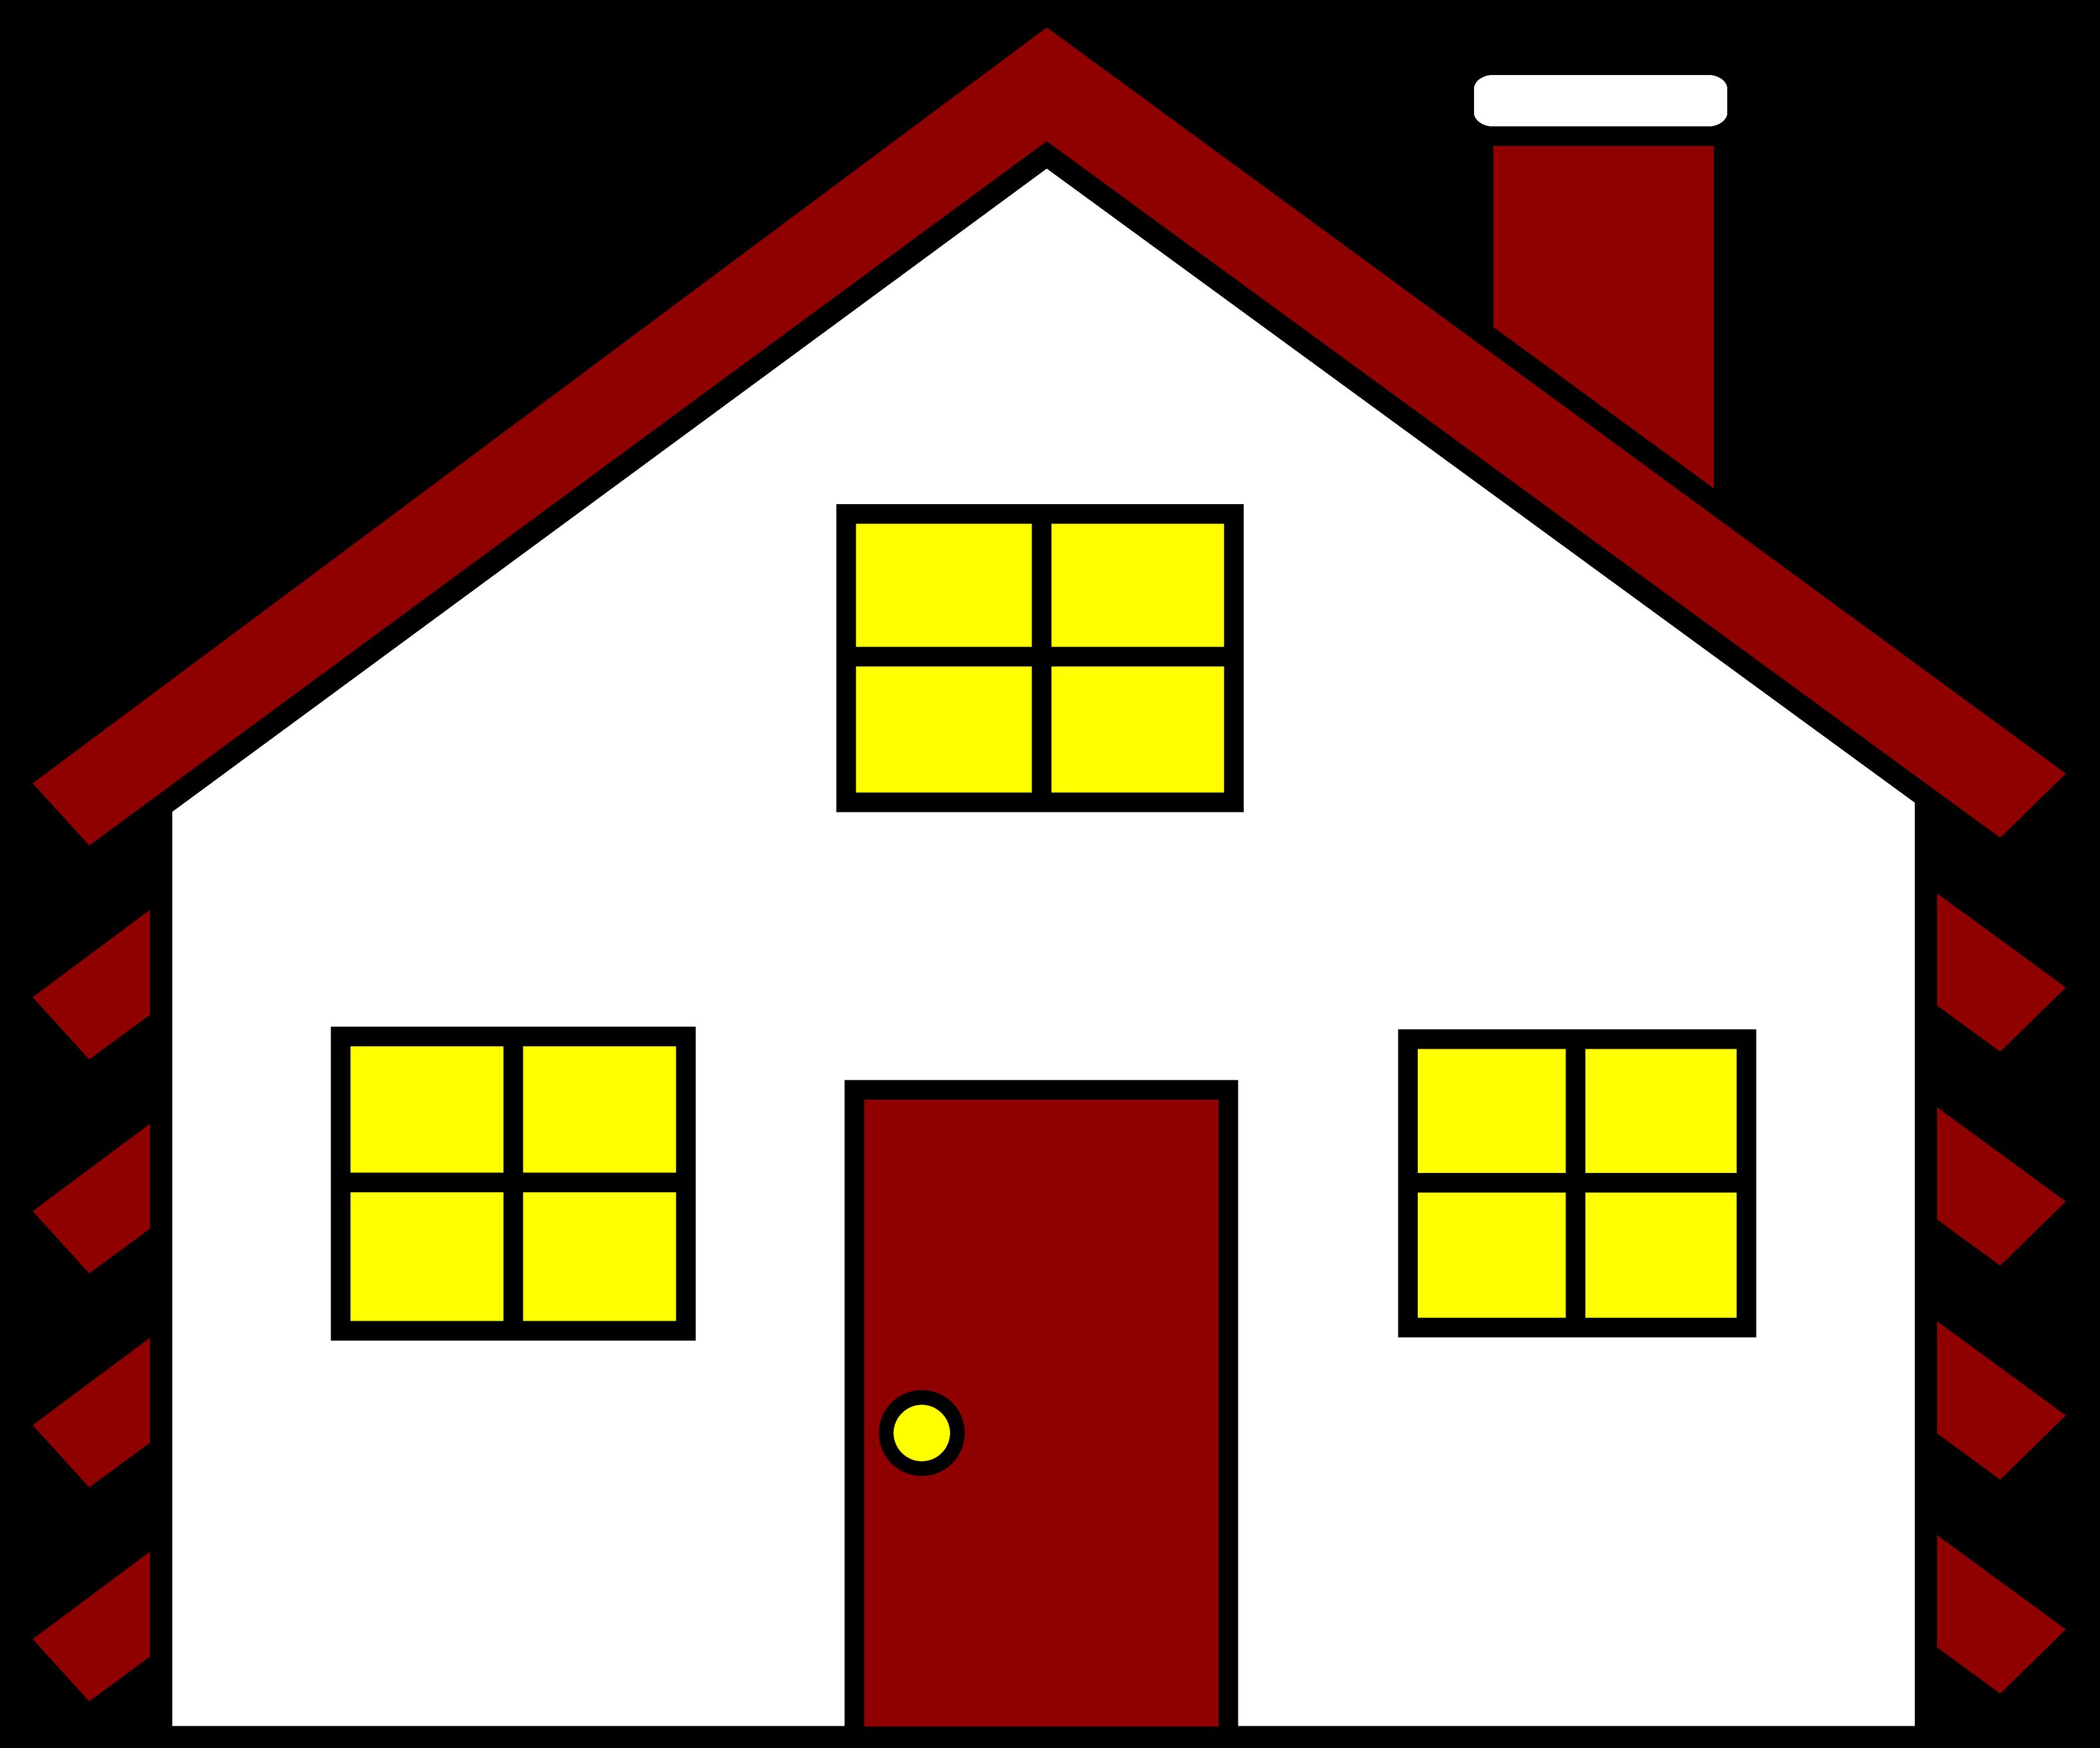 house clipart-house clipart-1